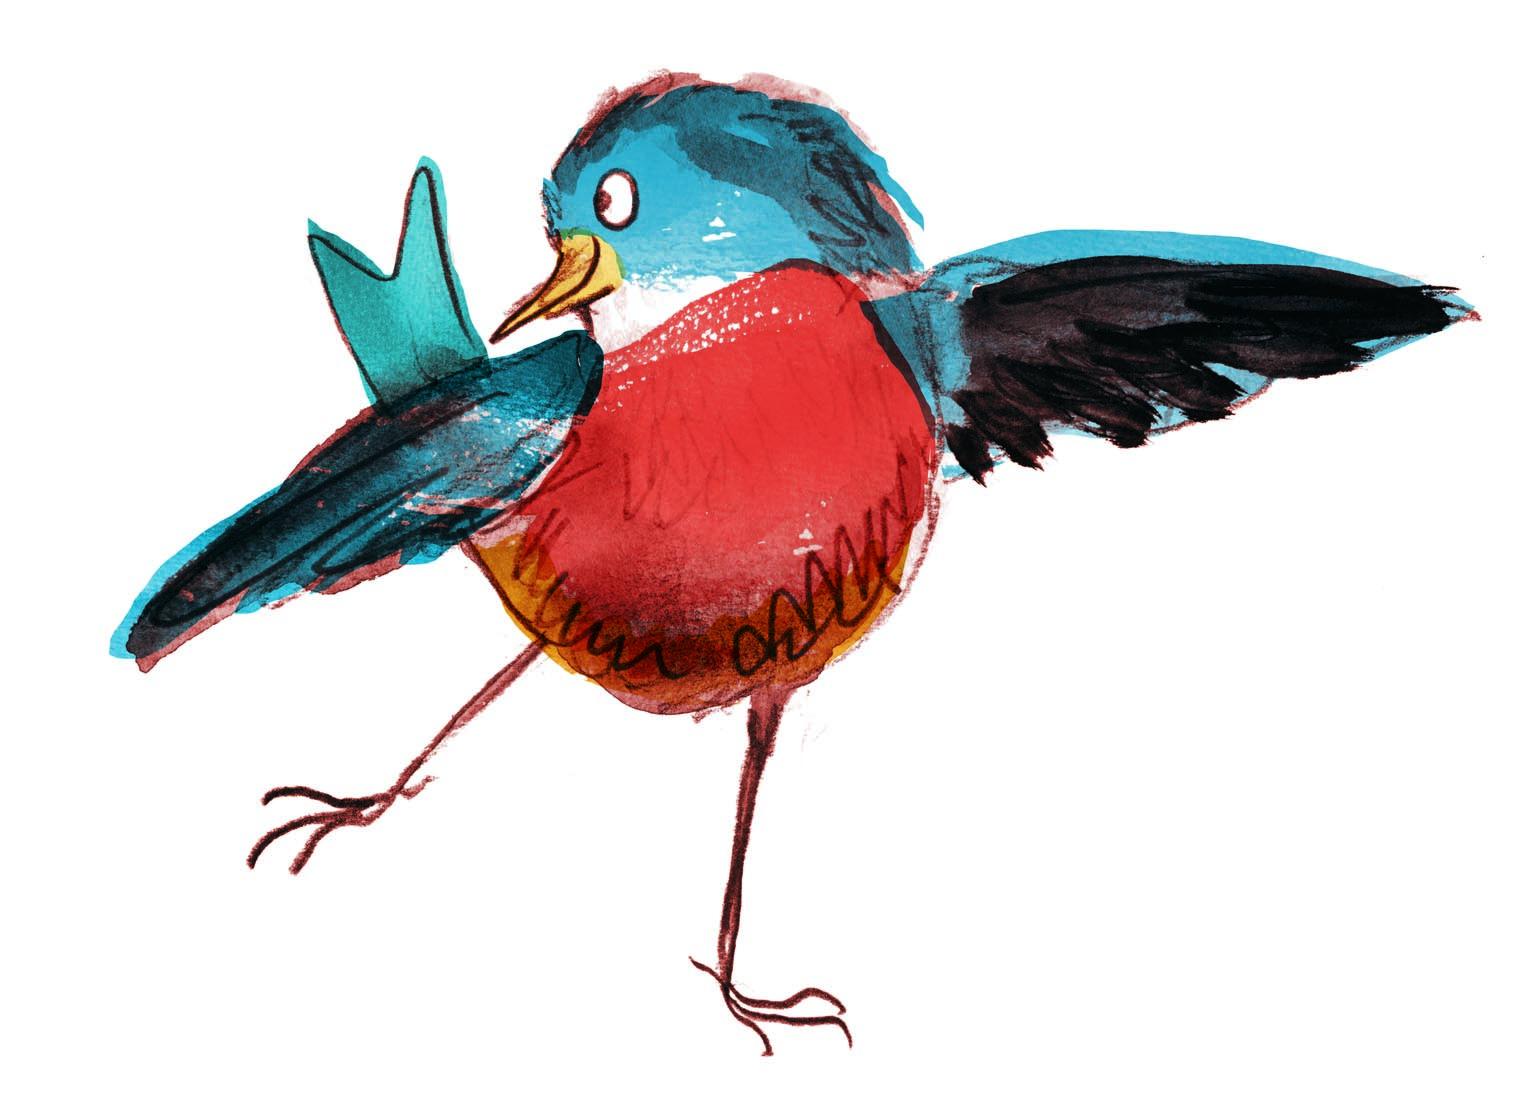 bluebird test judywatsonart